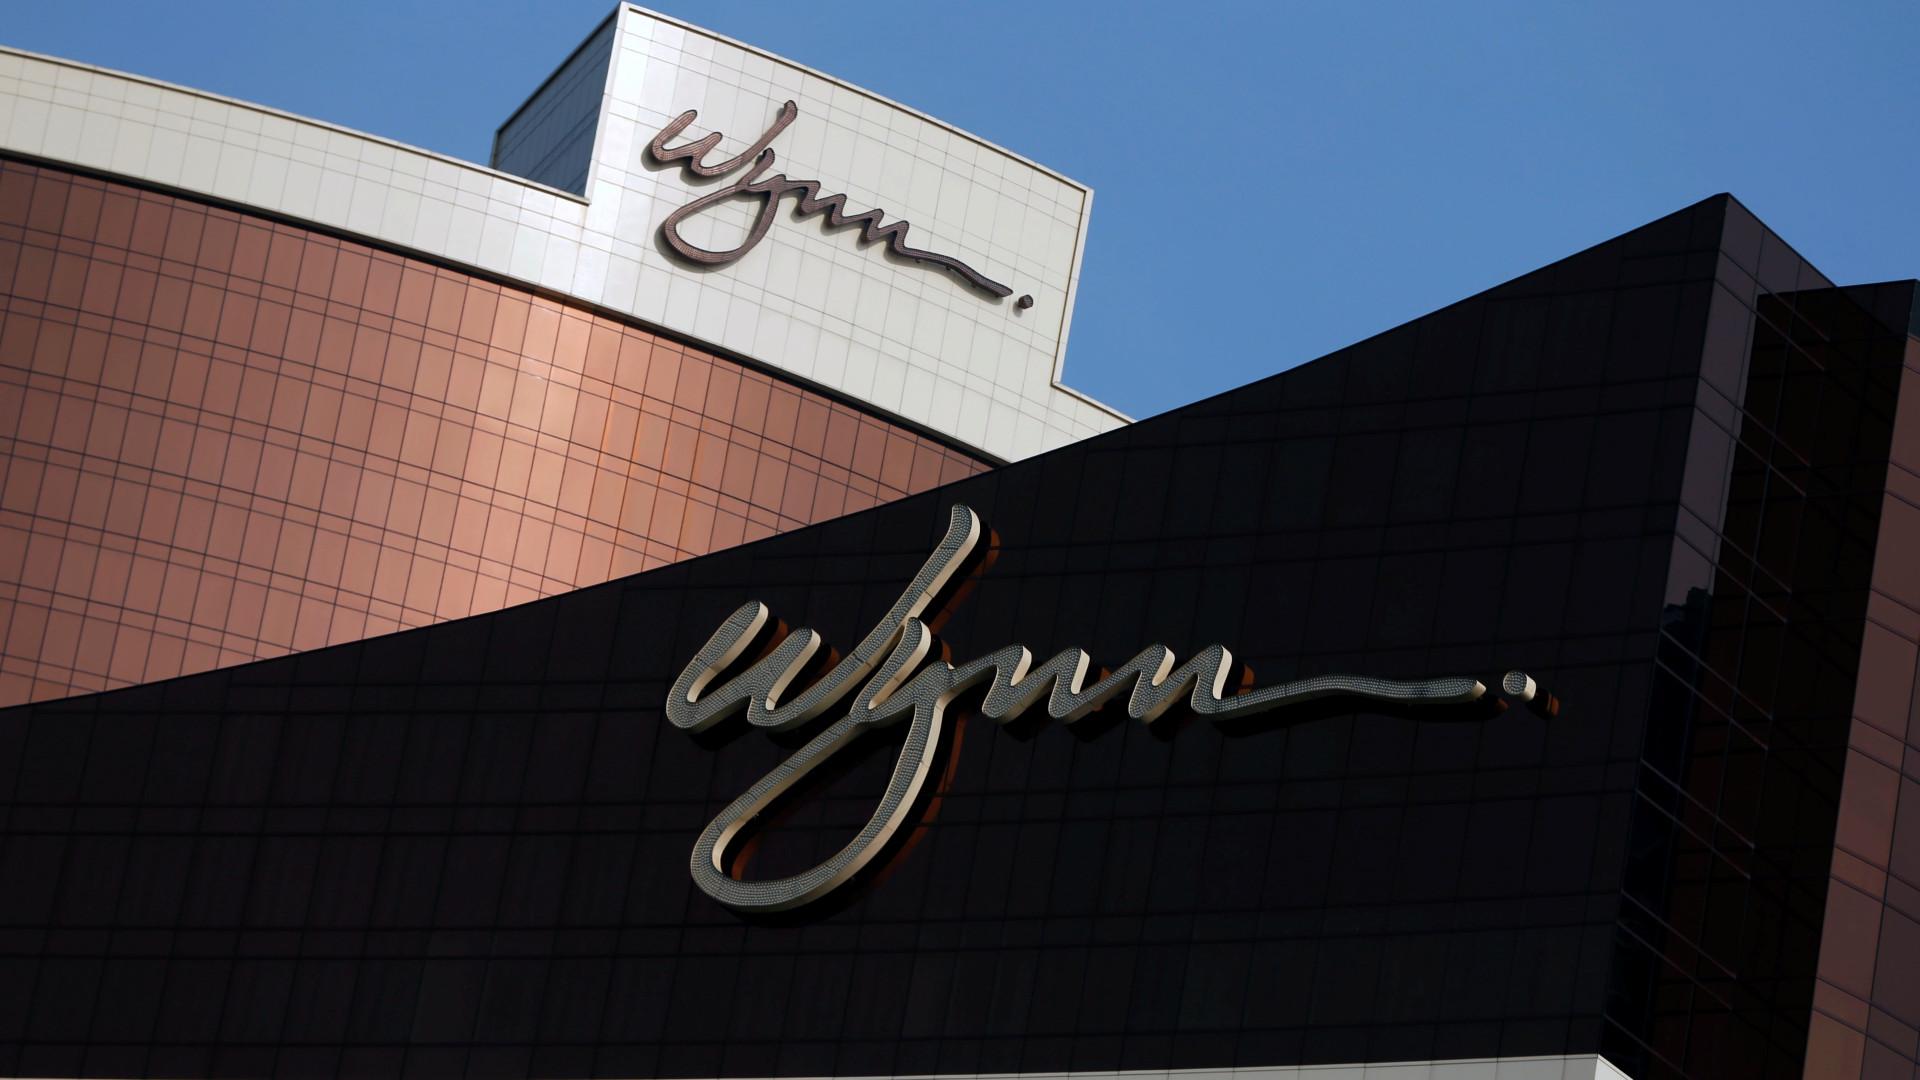 Operadora Wynn Resorts perde batalha legal com Universal Entertainment